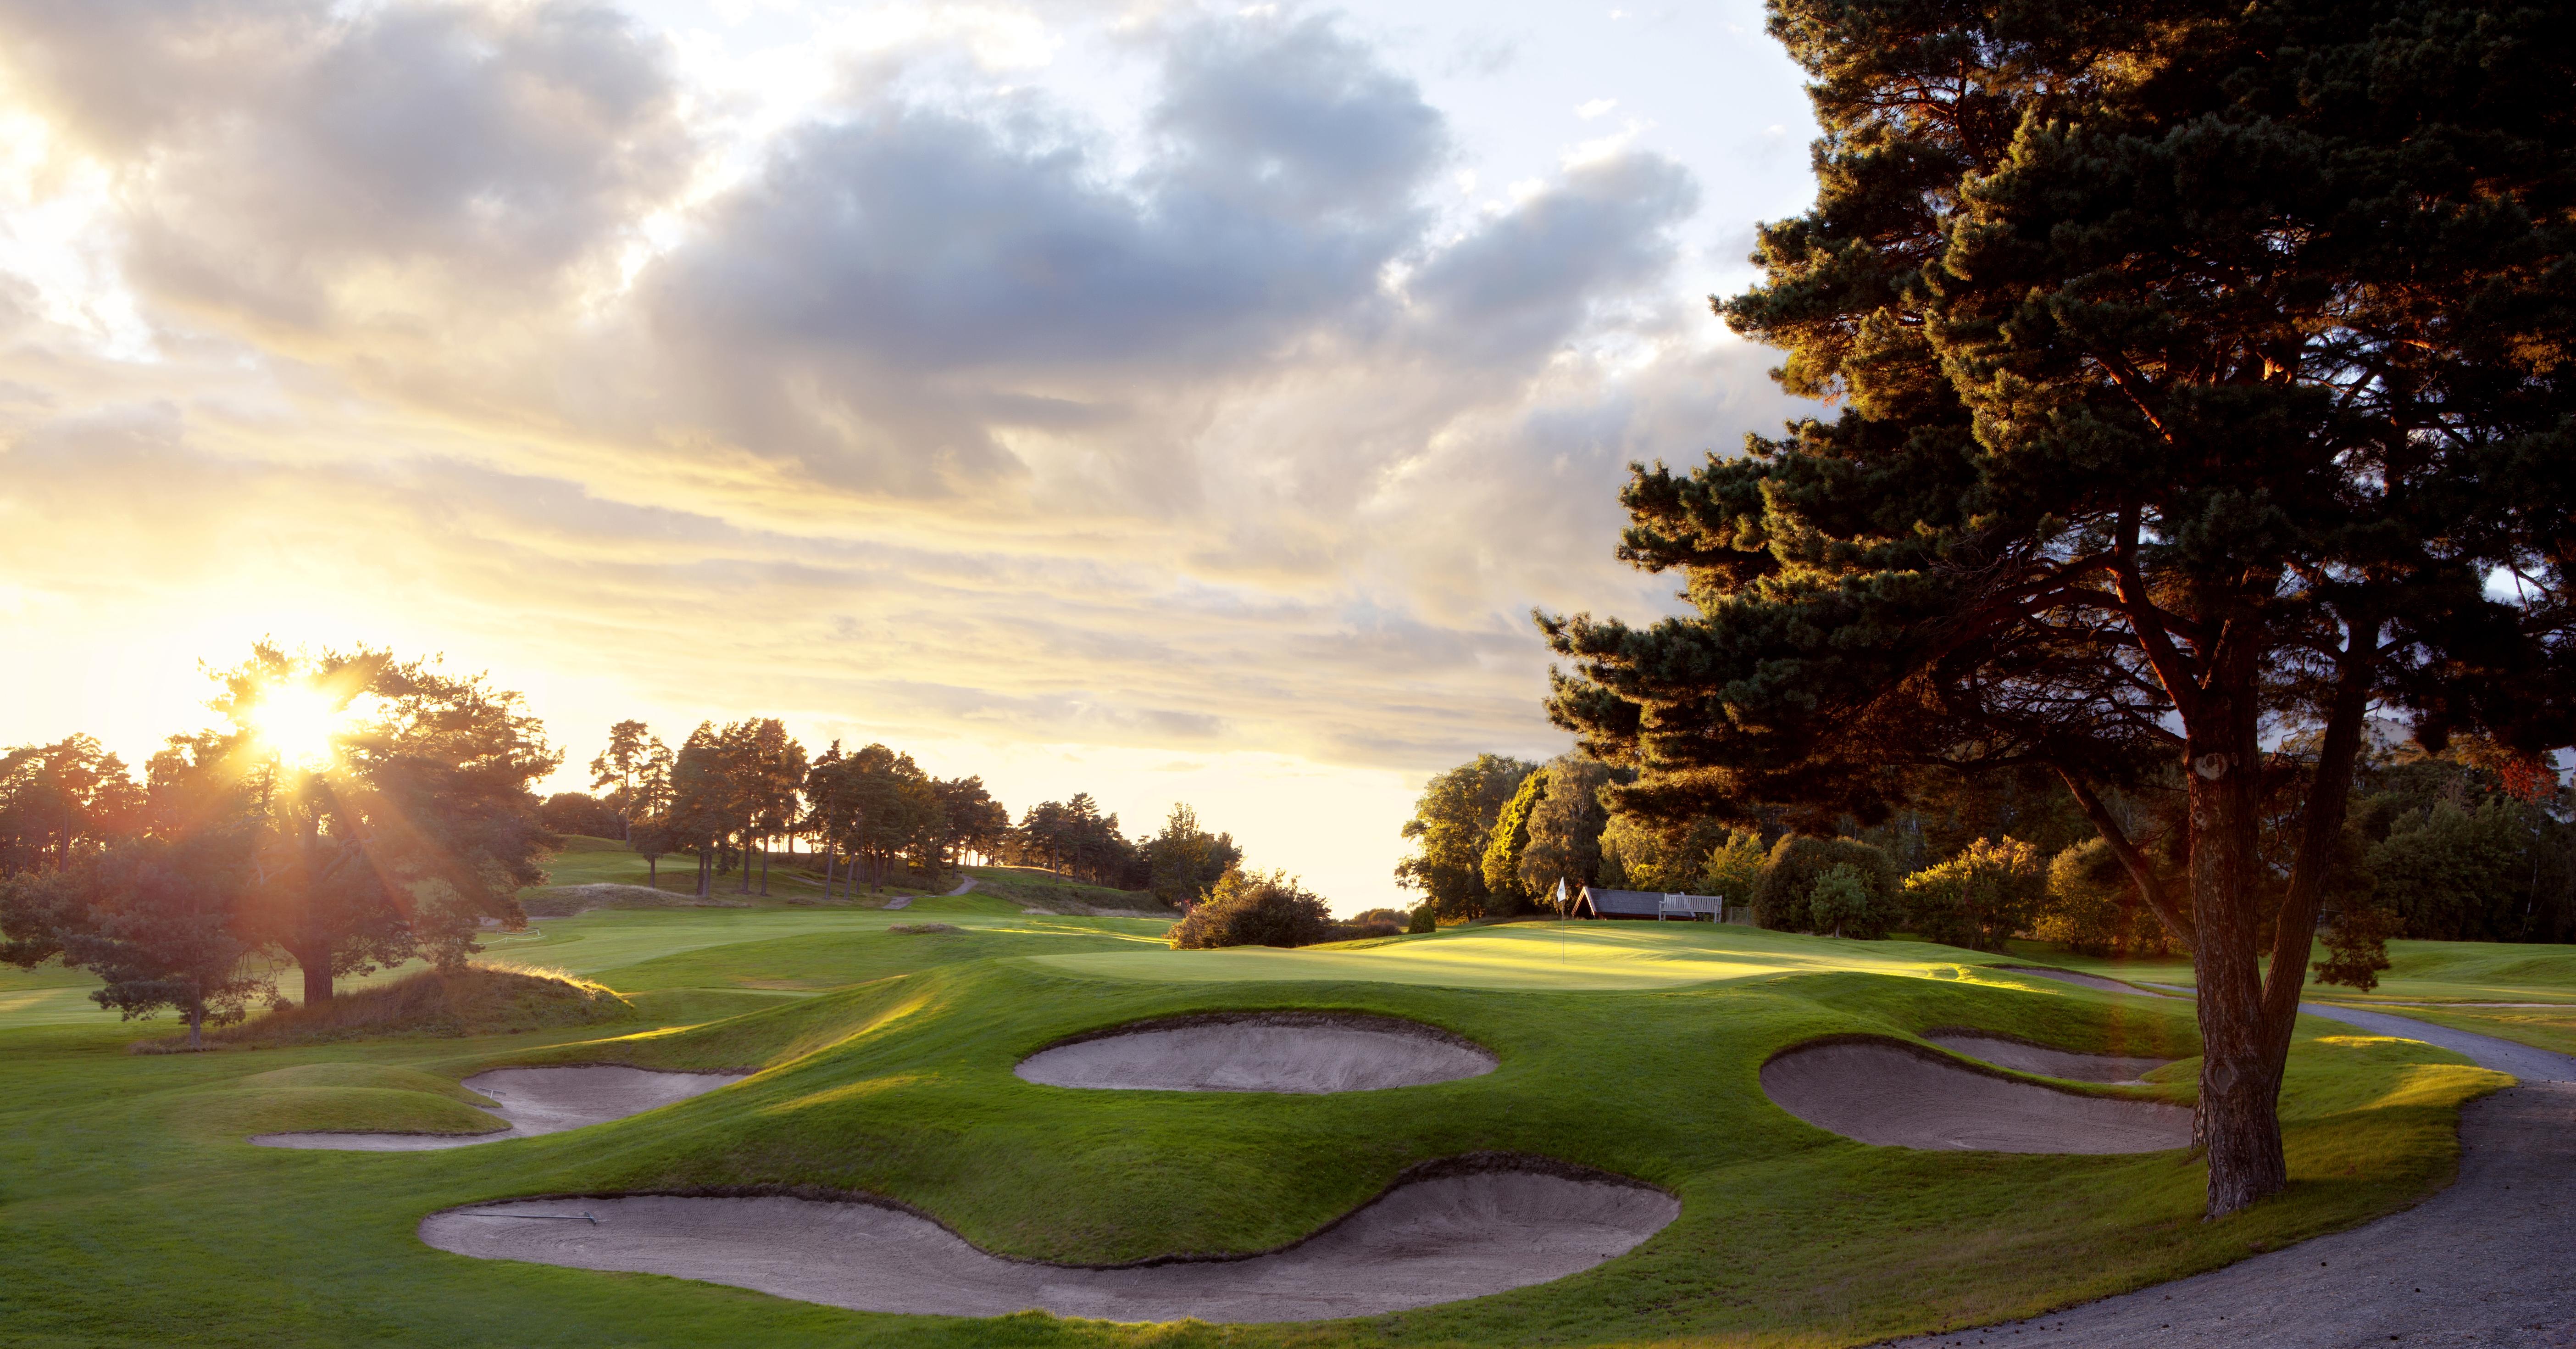 Golfbanan i solnedgång